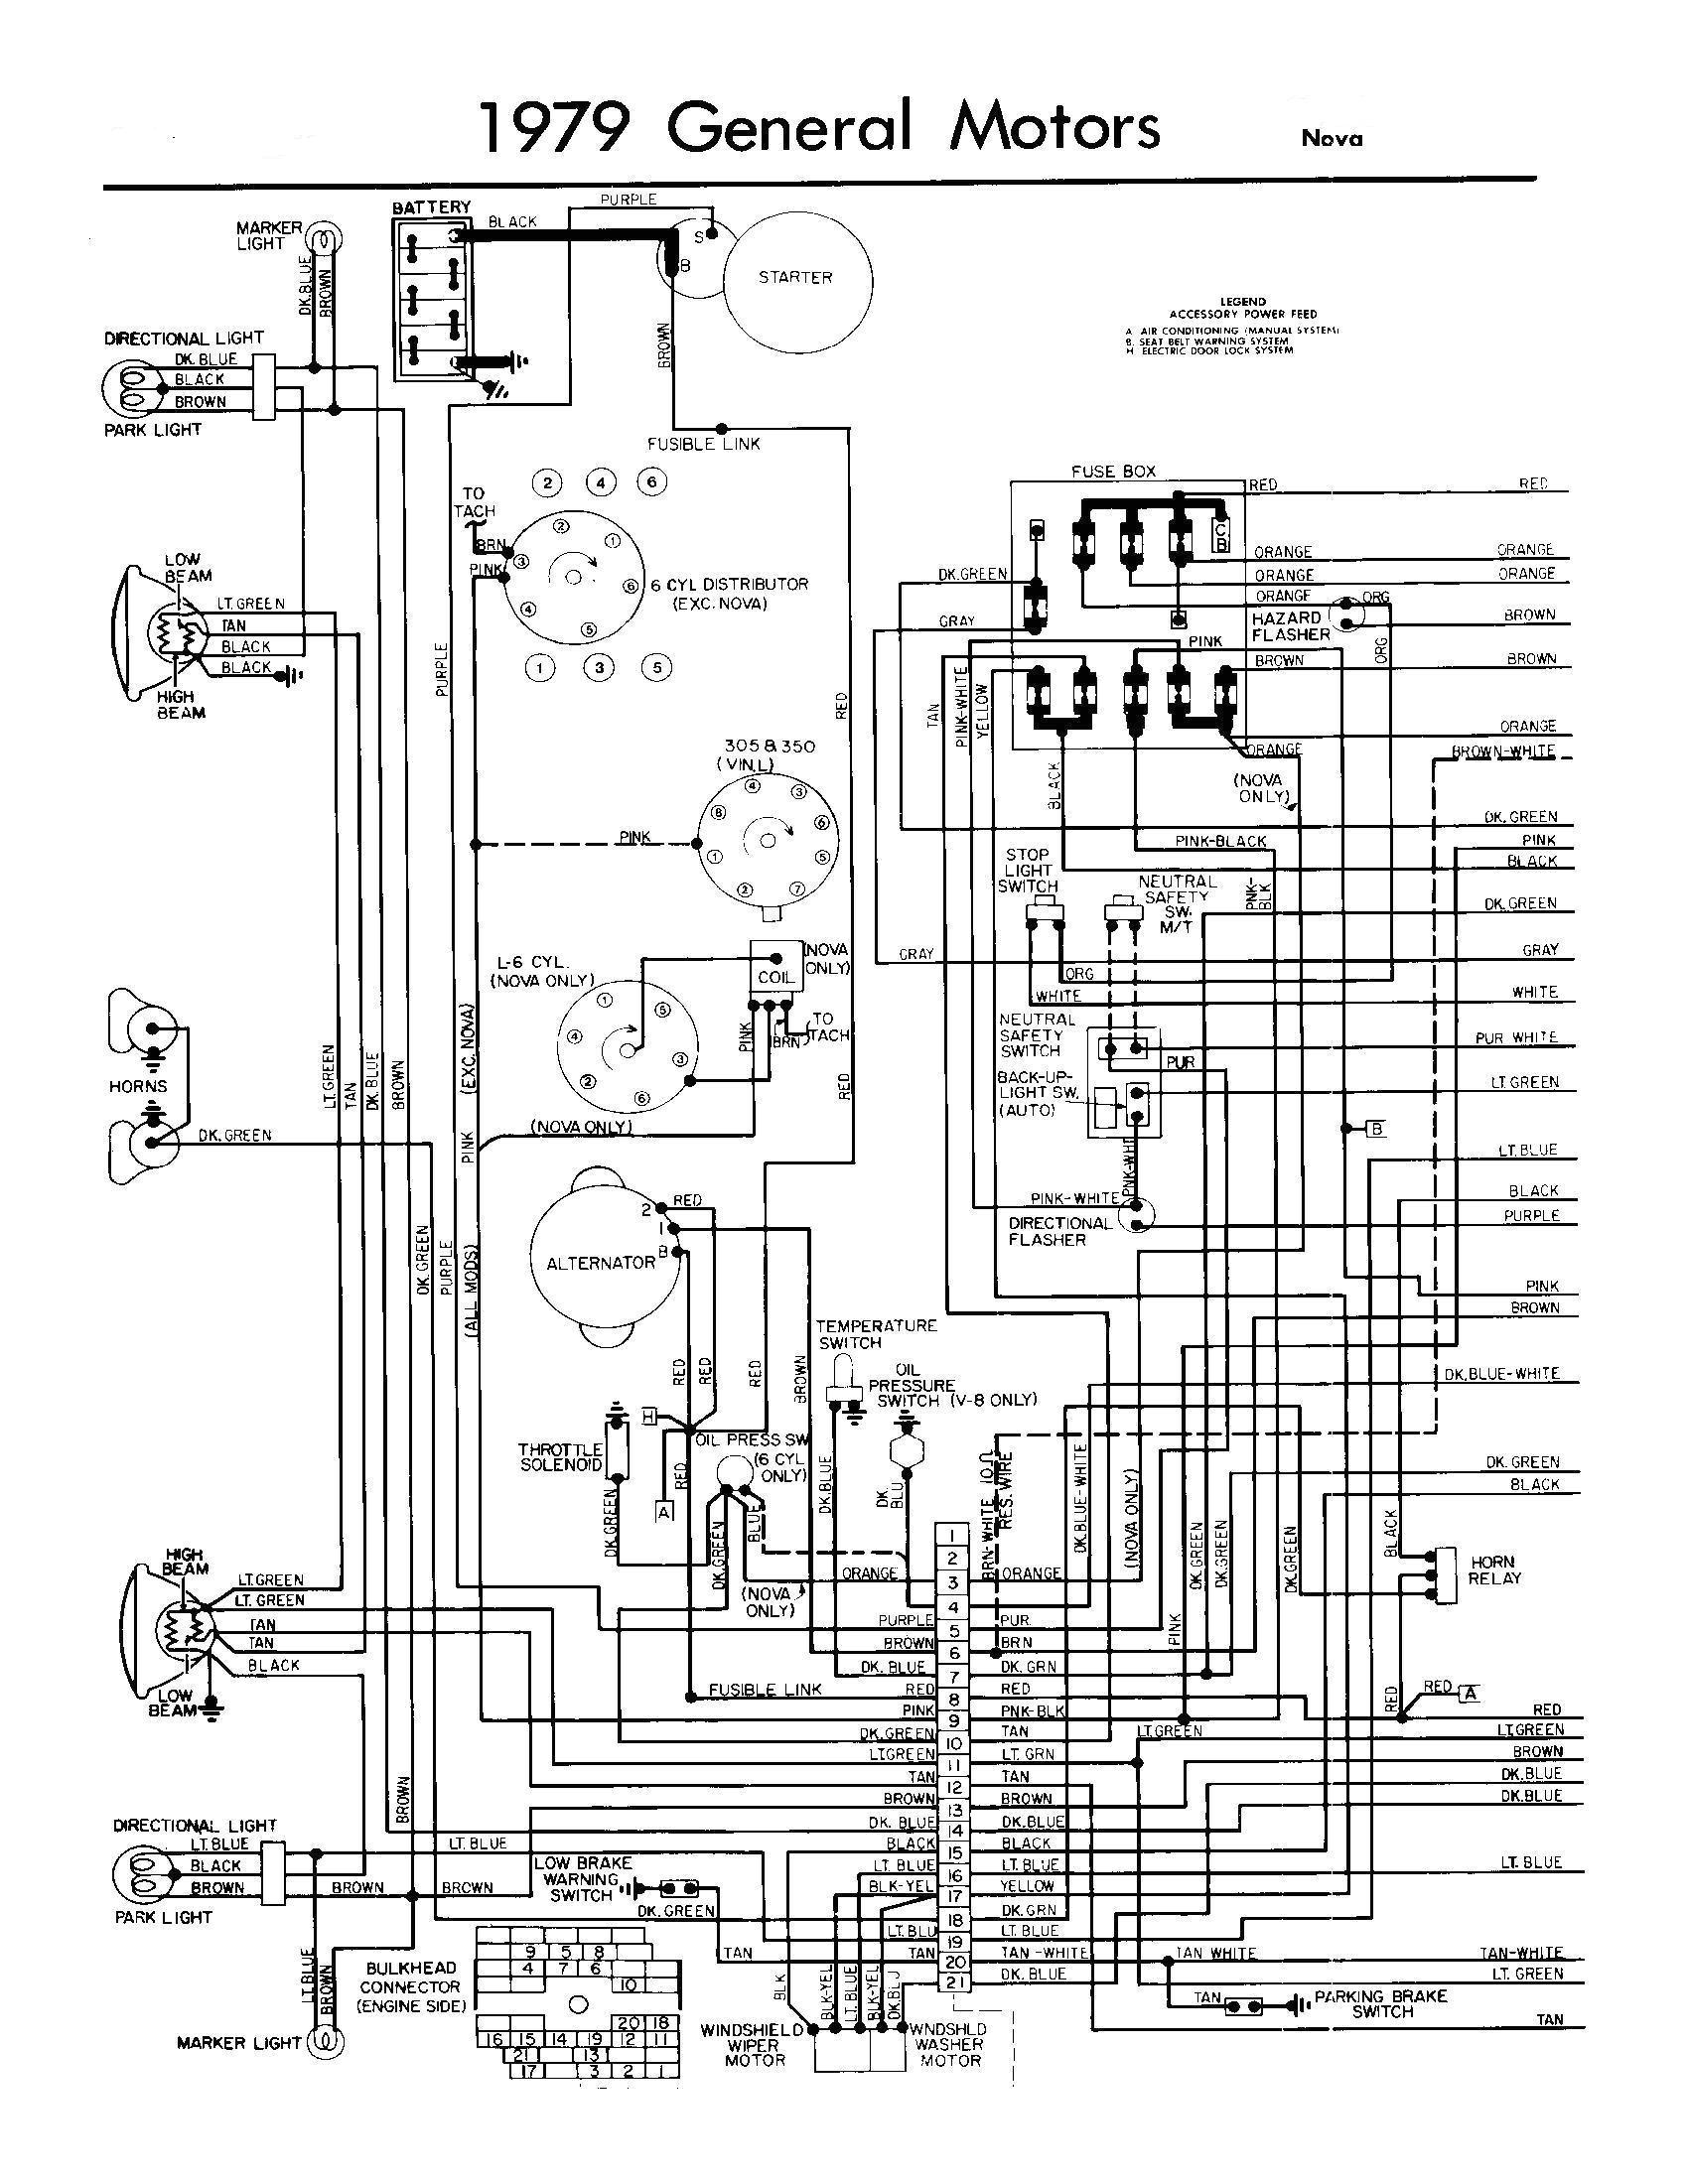 1960 chevy truck wiring diagram wiring diagram img 1960 chevrolet wiring diagram wiring diagram name 1960